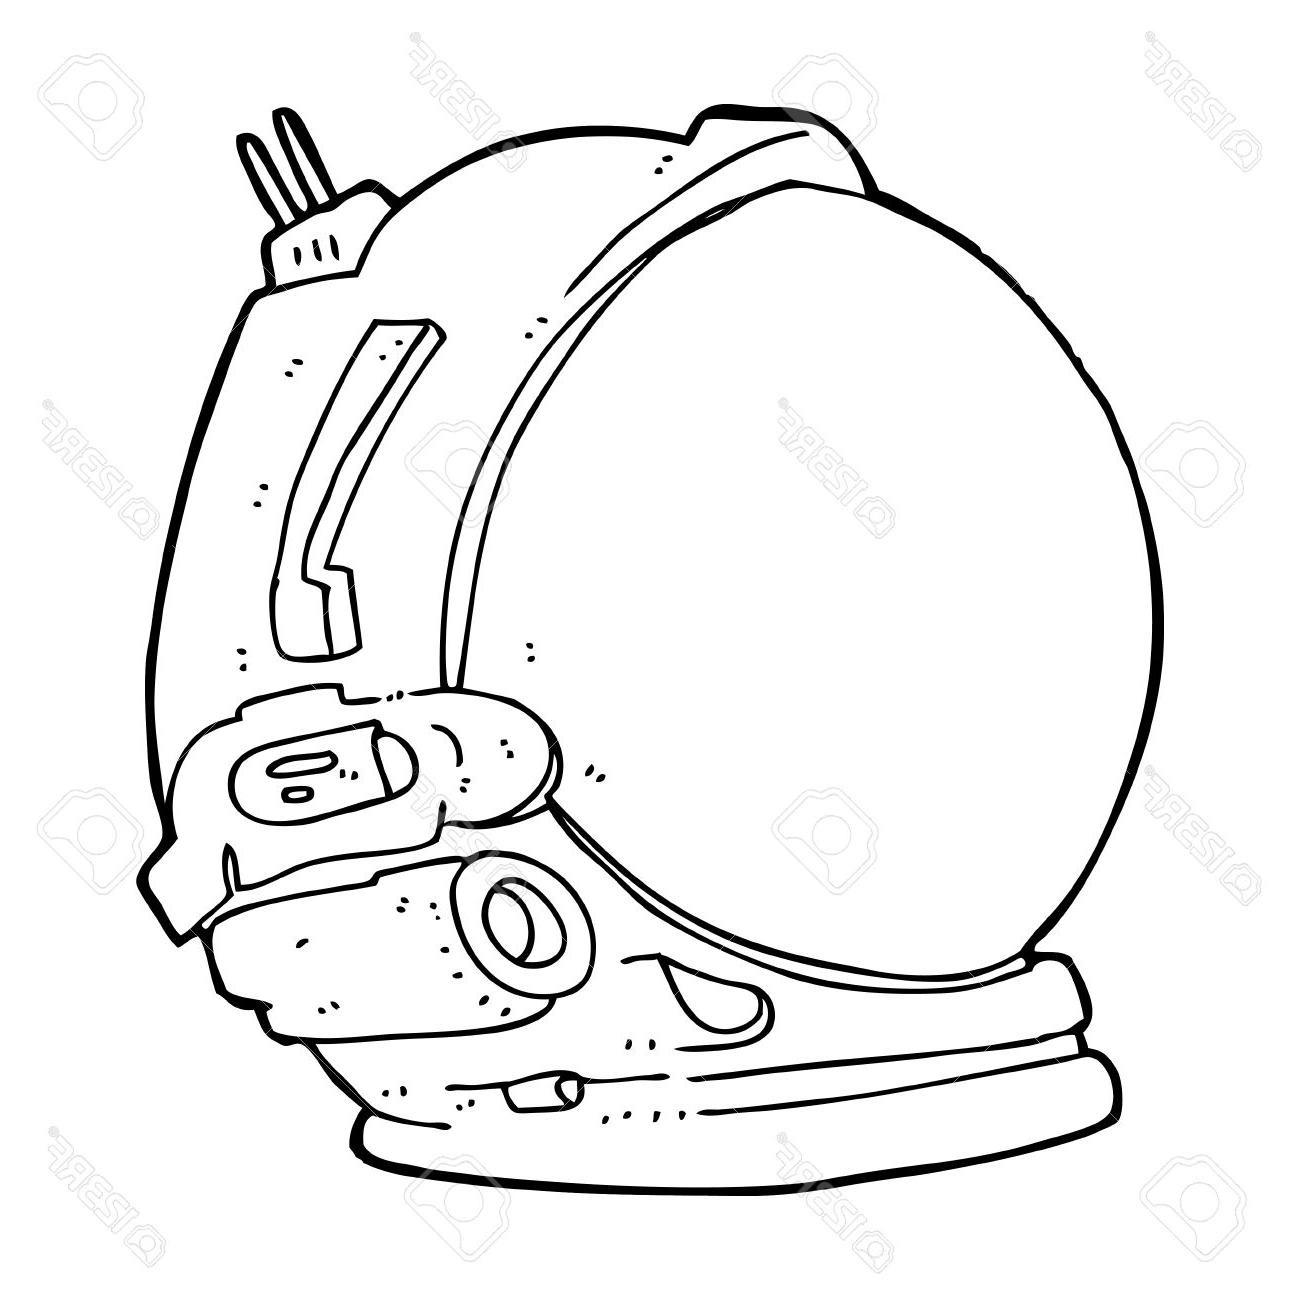 Astronaut clipart astronaut helmet. Best of letter master